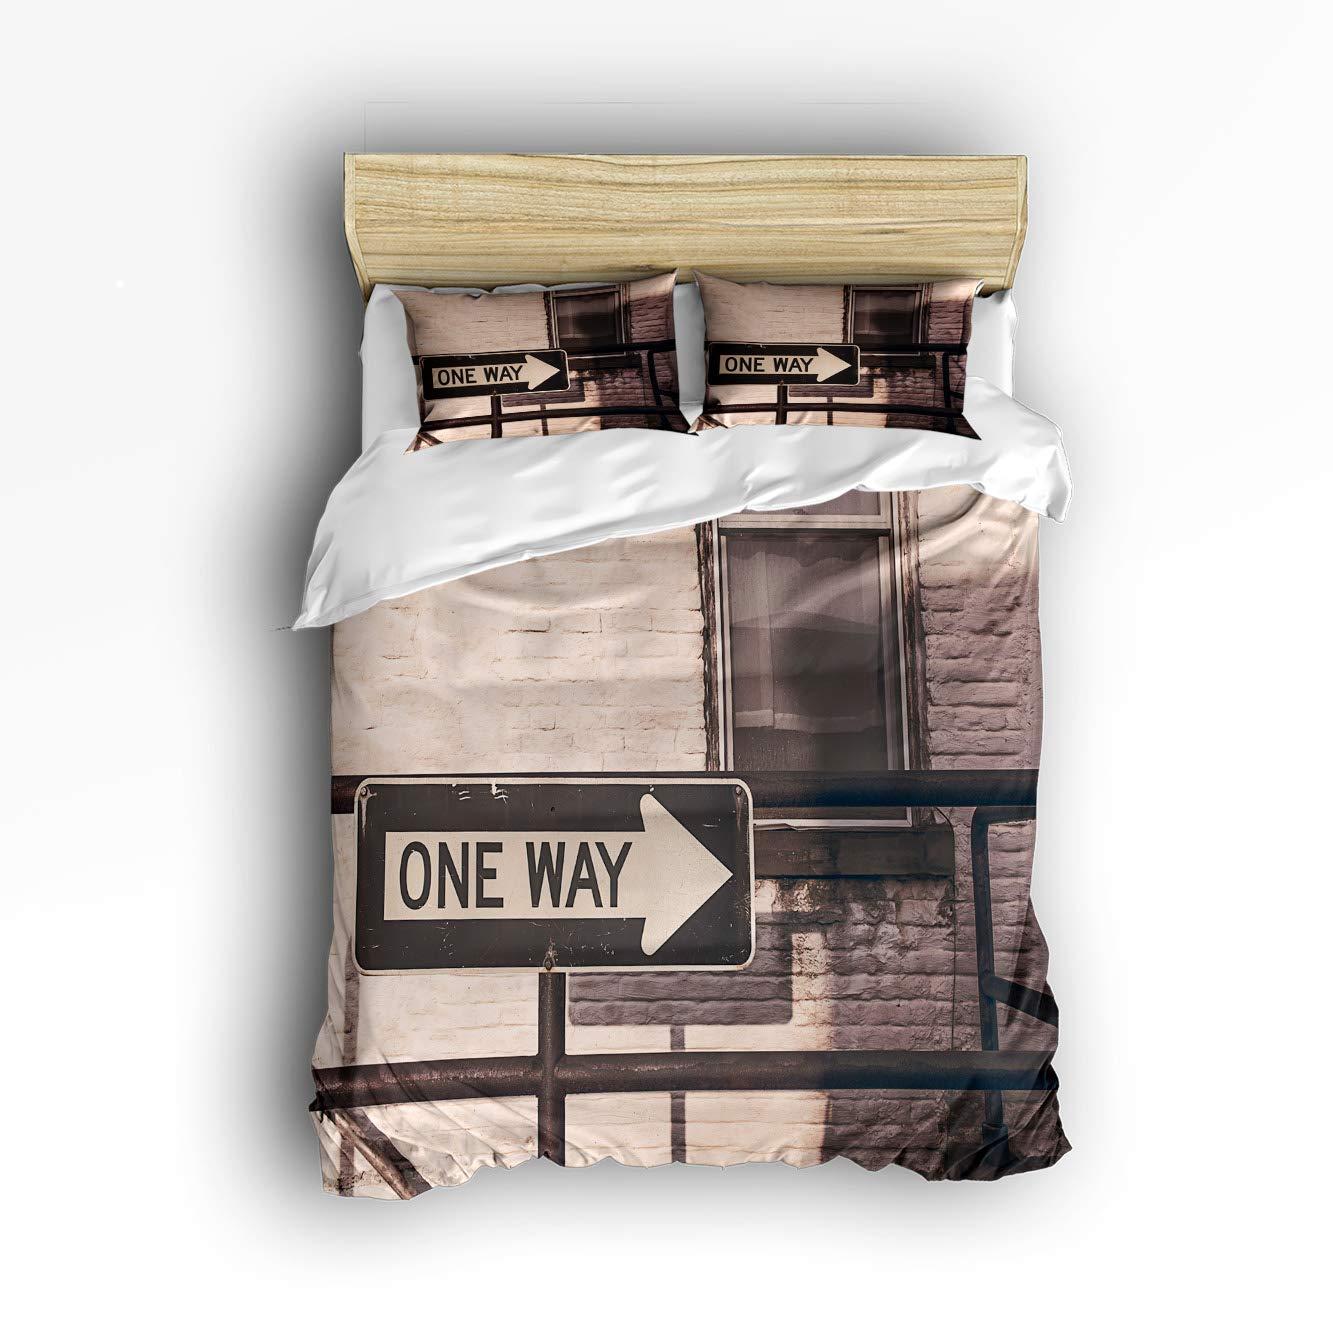 DCGARING 3 Piece Duvet Cover Bedding Set- Nostalgic Signpost Railing Brick Wall Window Retro -Ultra Comfy,Breathable,Zipper Closure(1 Duvet Cover+2 Pillow Shams) Twin